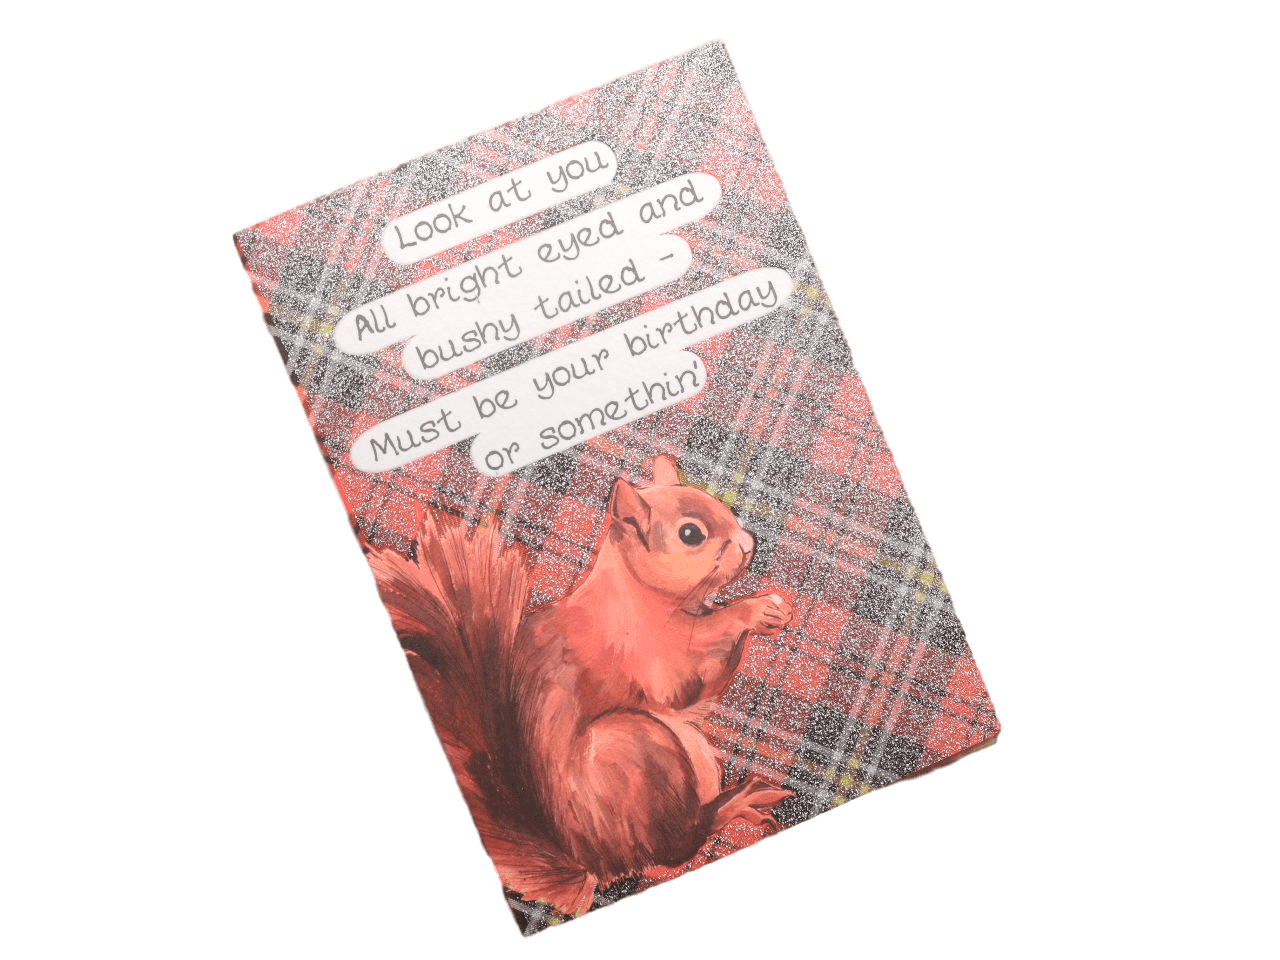 scottish birthday card tartan squirrel doric scots language humorous funny